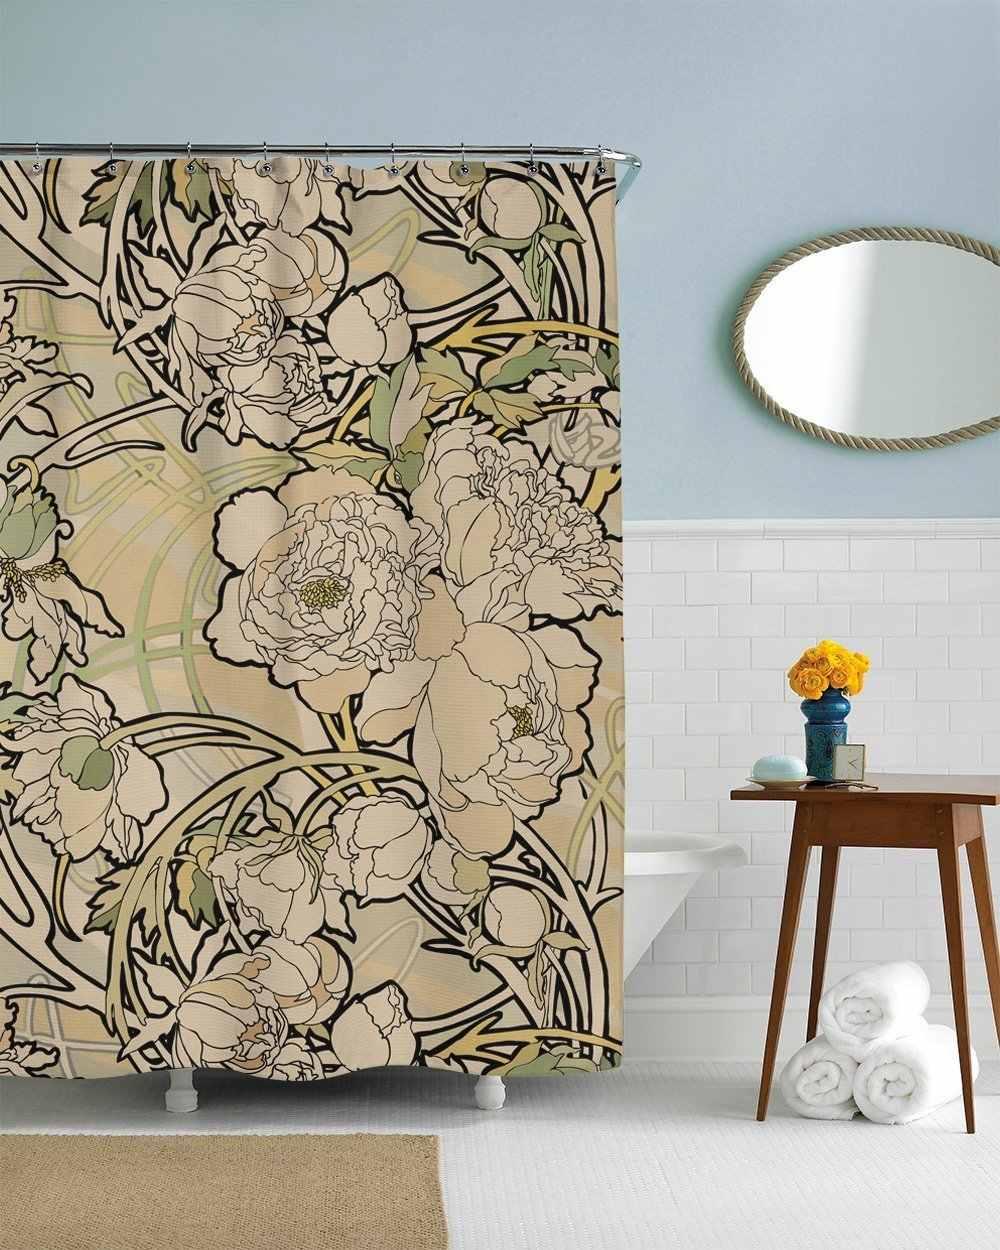 Floral Shower Curtain Set Creme Art Nouveau Flowers Nature Bathroom Decor With 12 Hooks Included